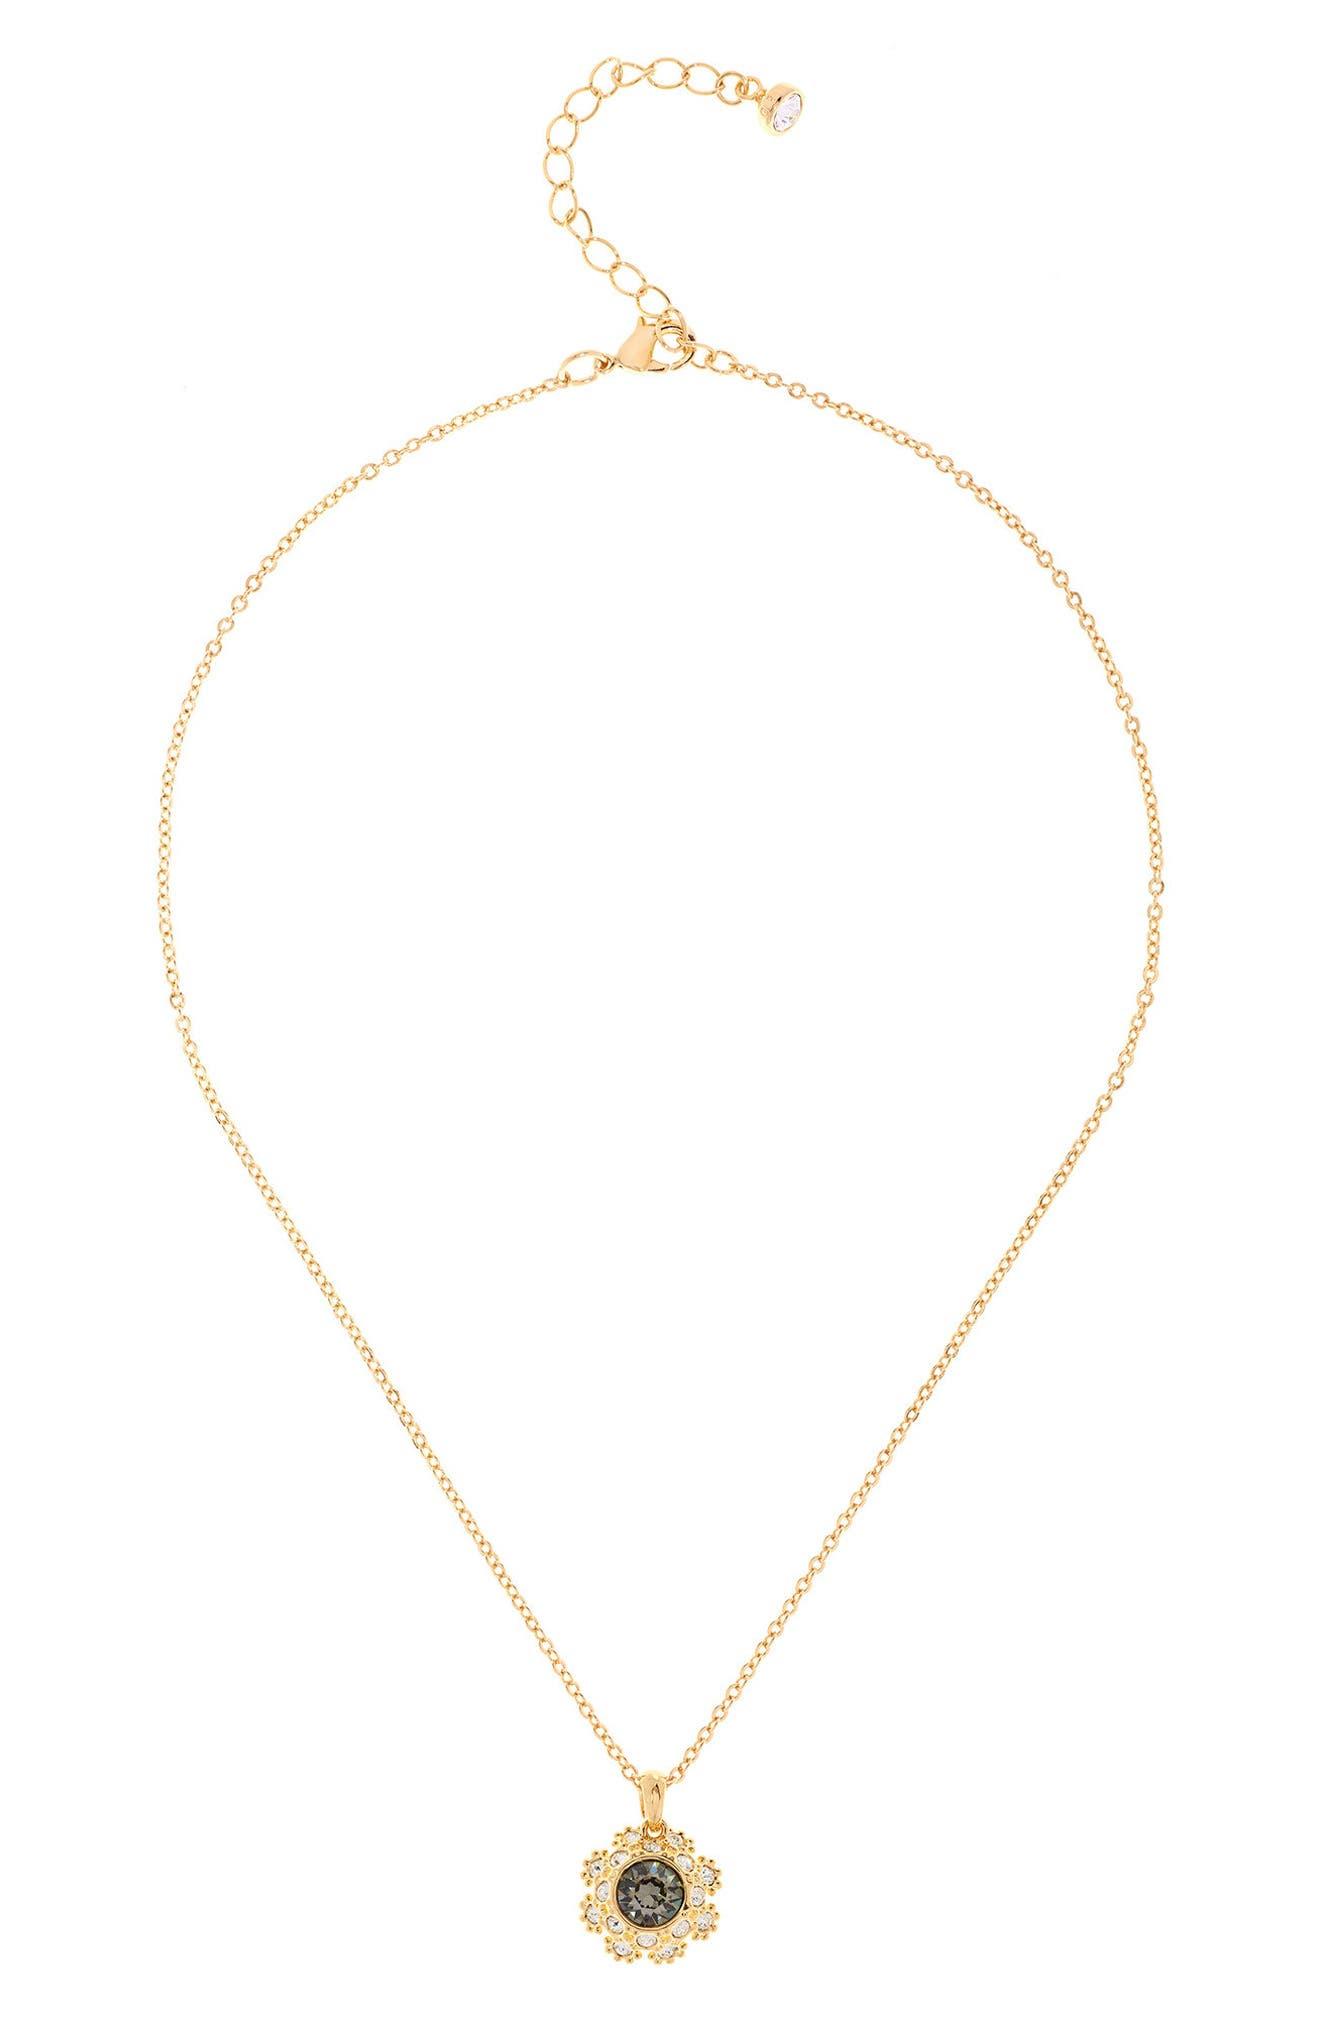 Crystal Daisy Lace Pendant Necklace,                         Main,                         color, Jet